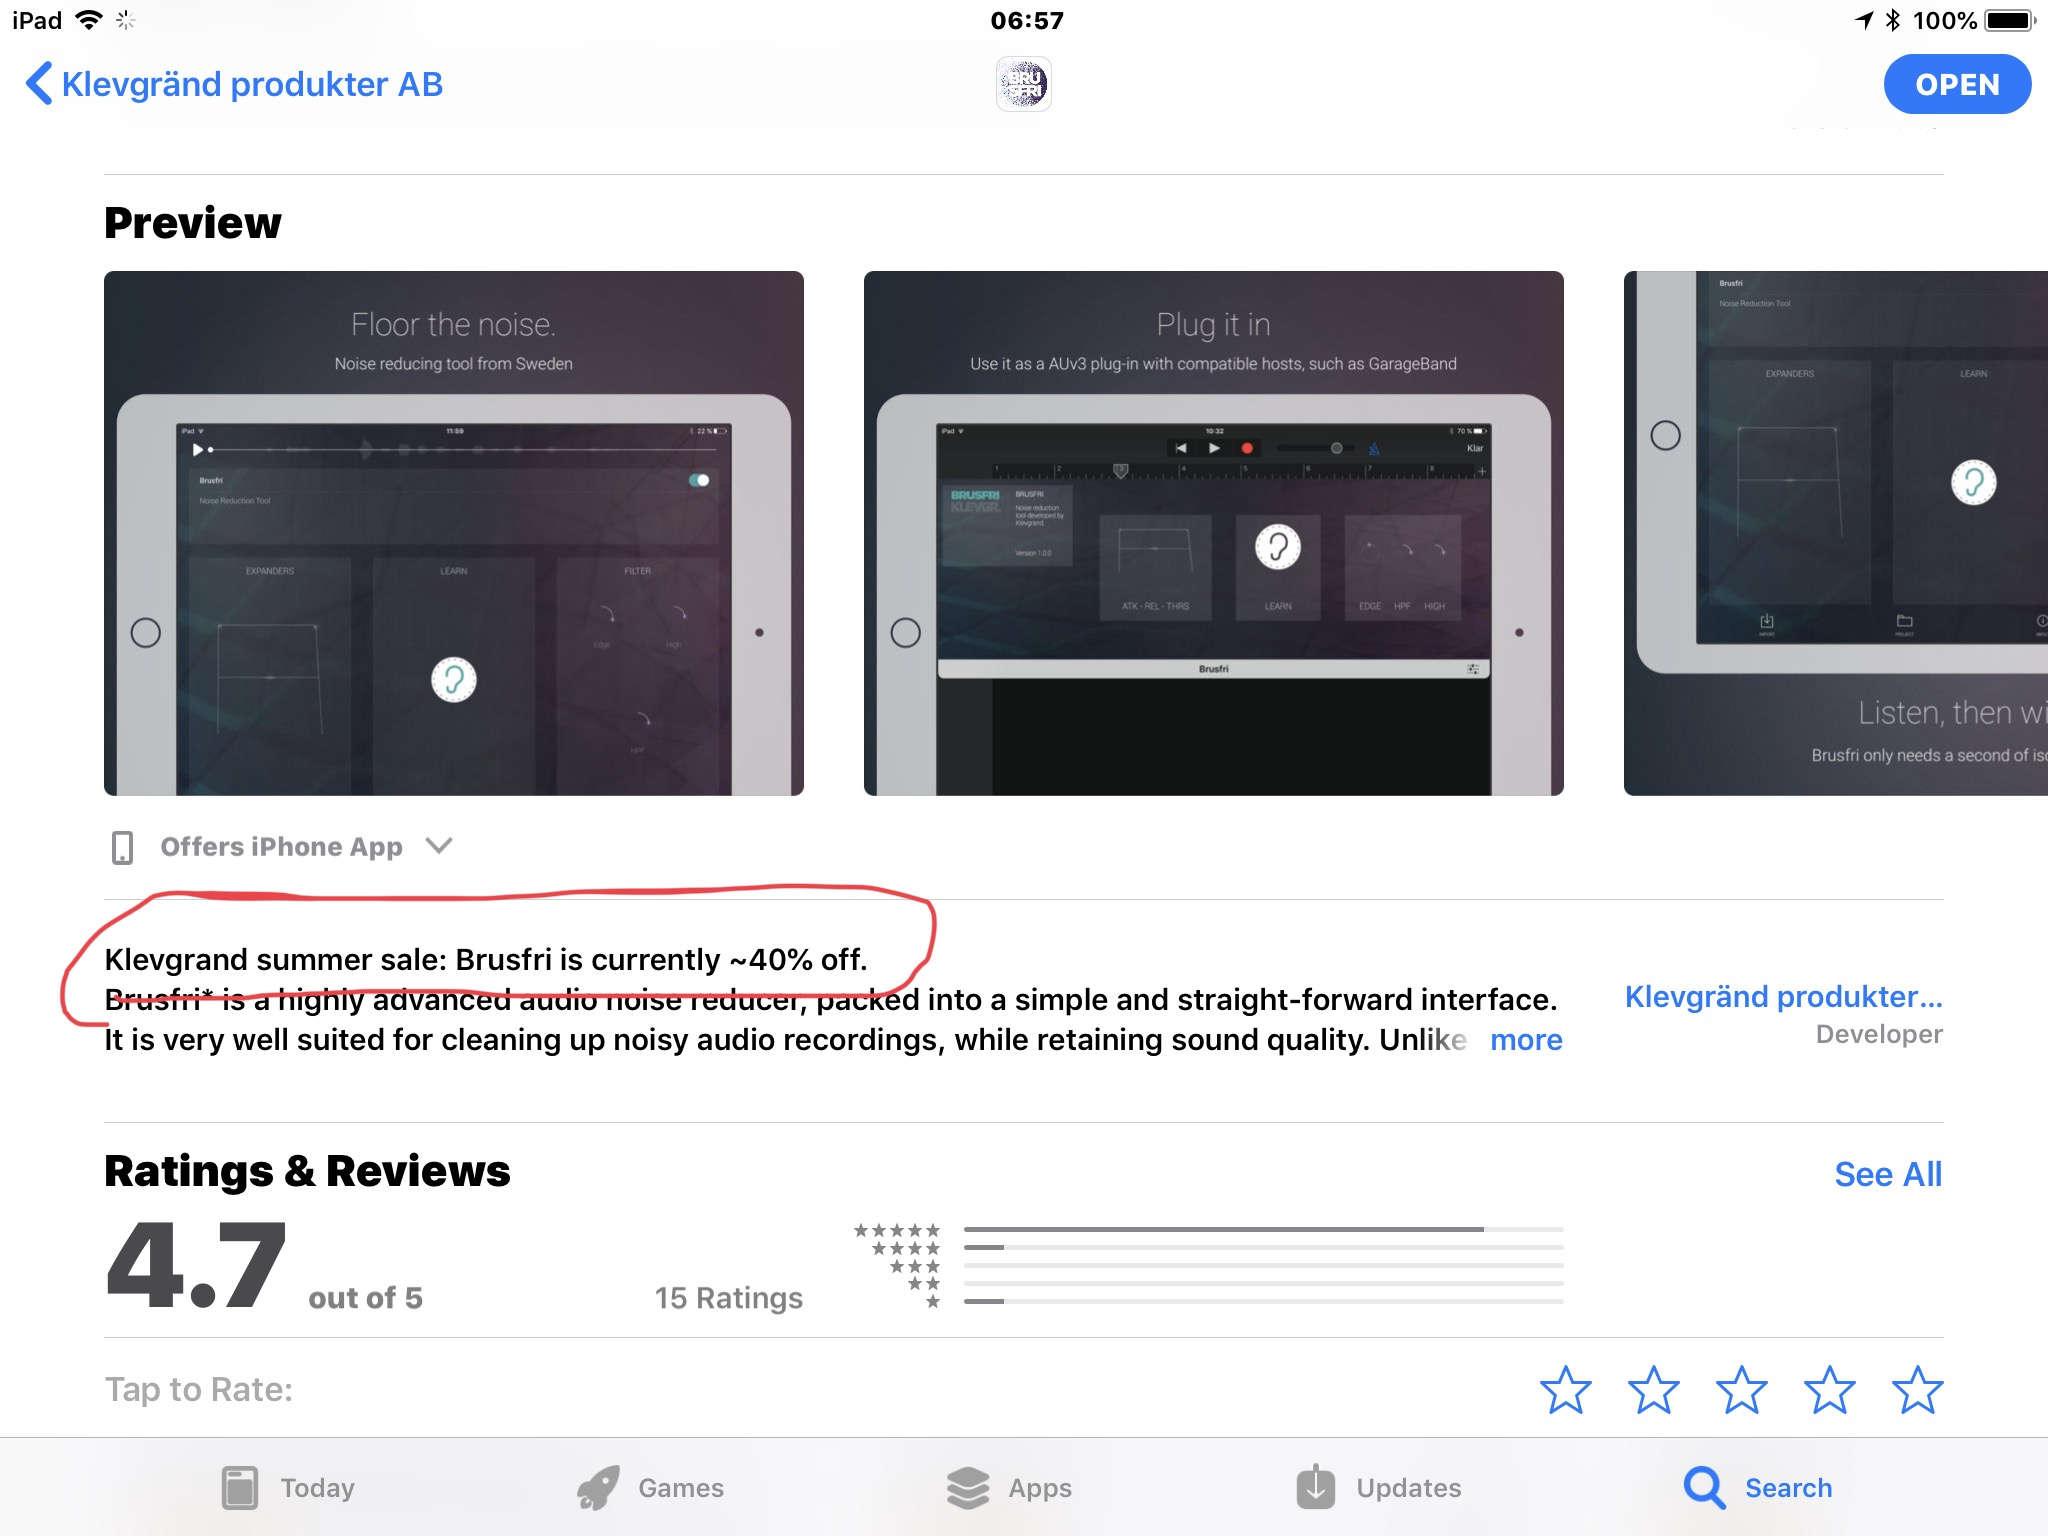 App Store NEW MATH? Klevgrand Apps 40% off sale — Audiobus Forum